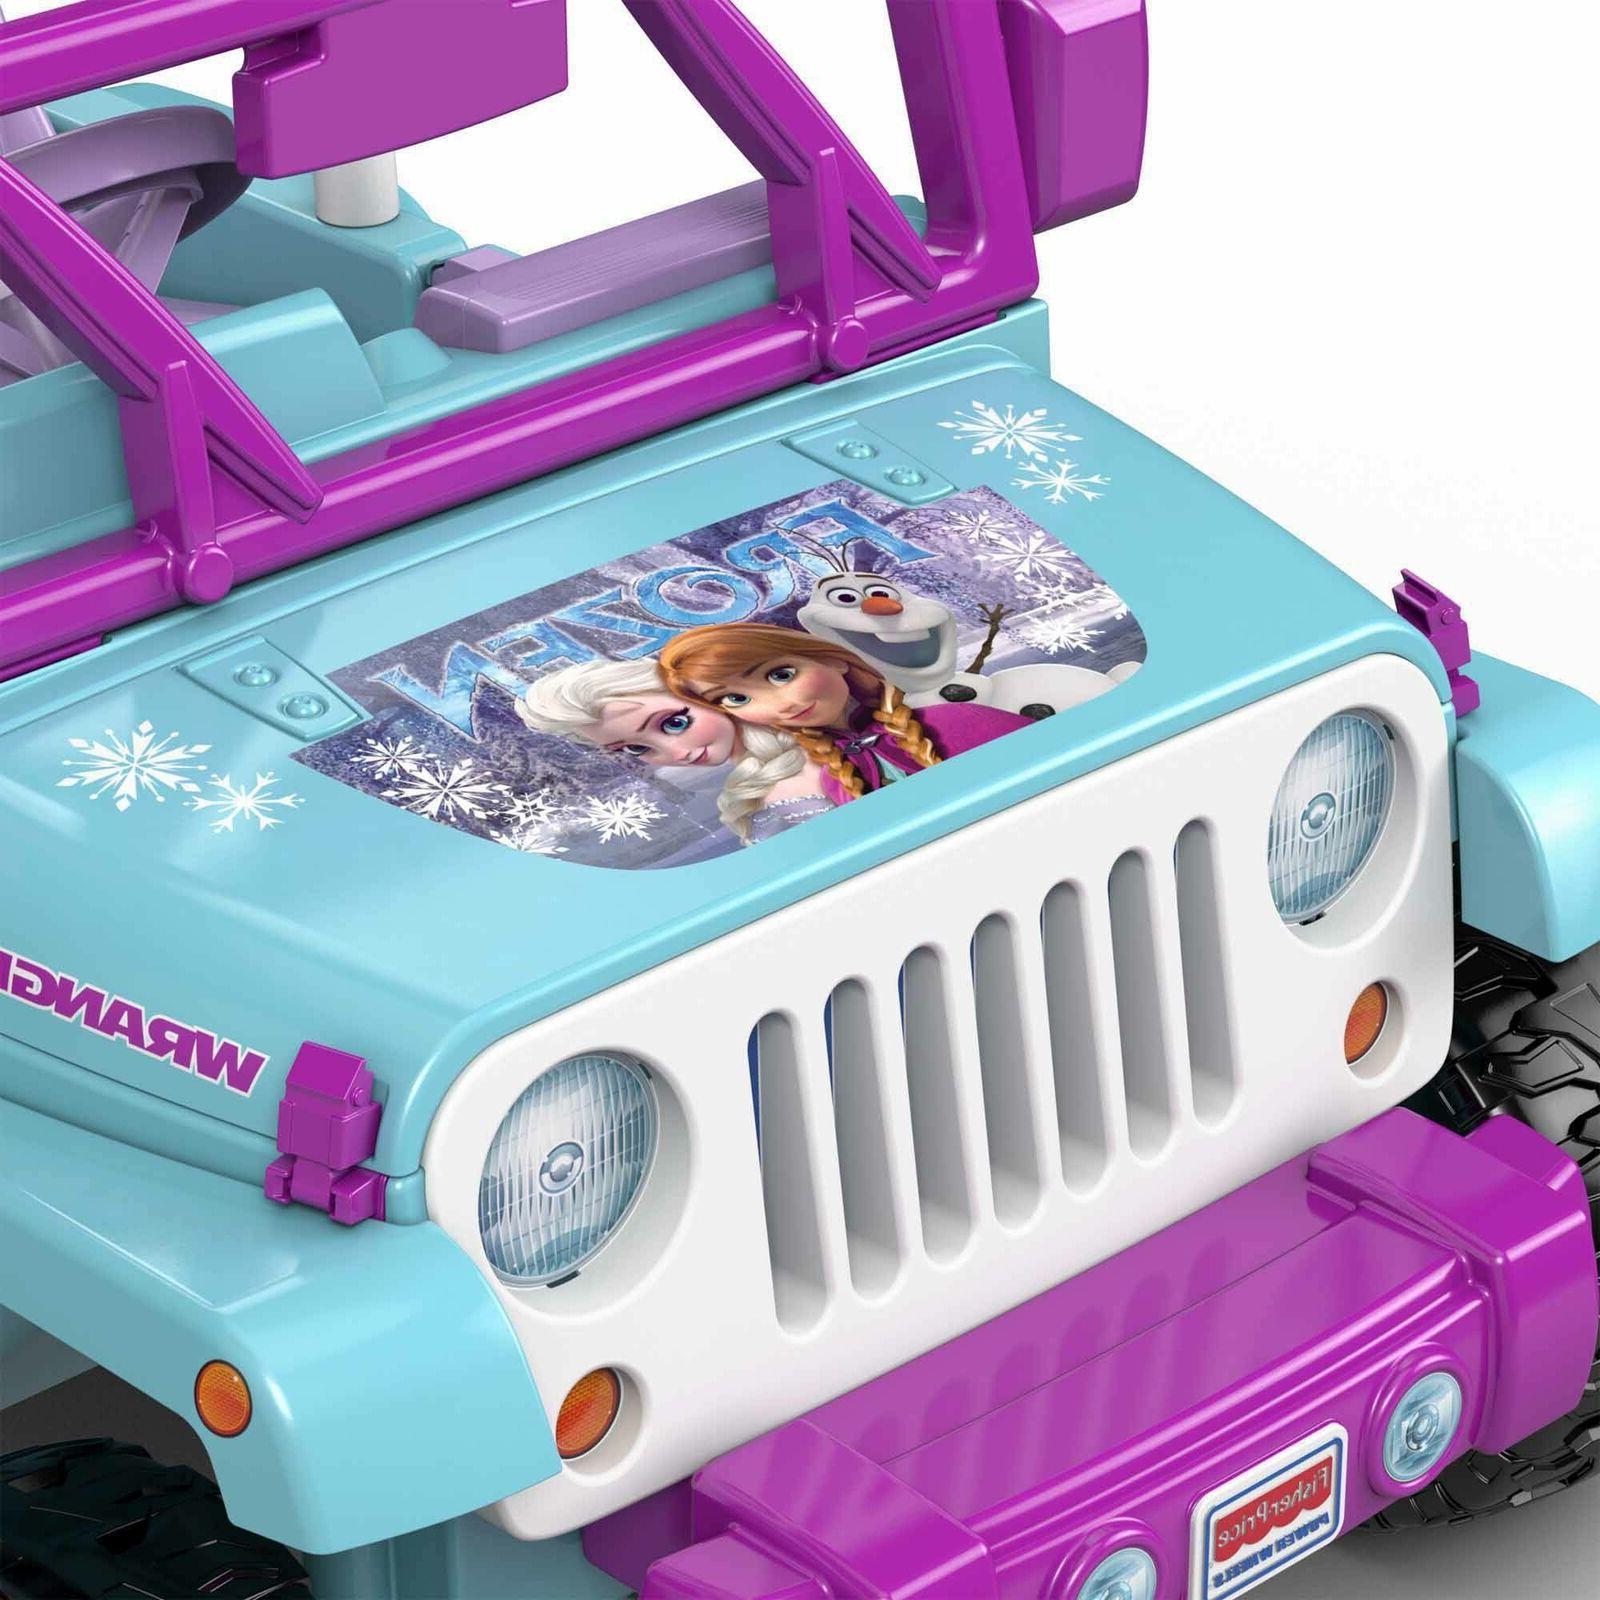 Power Frozen 2 Jeep 12-V Battery